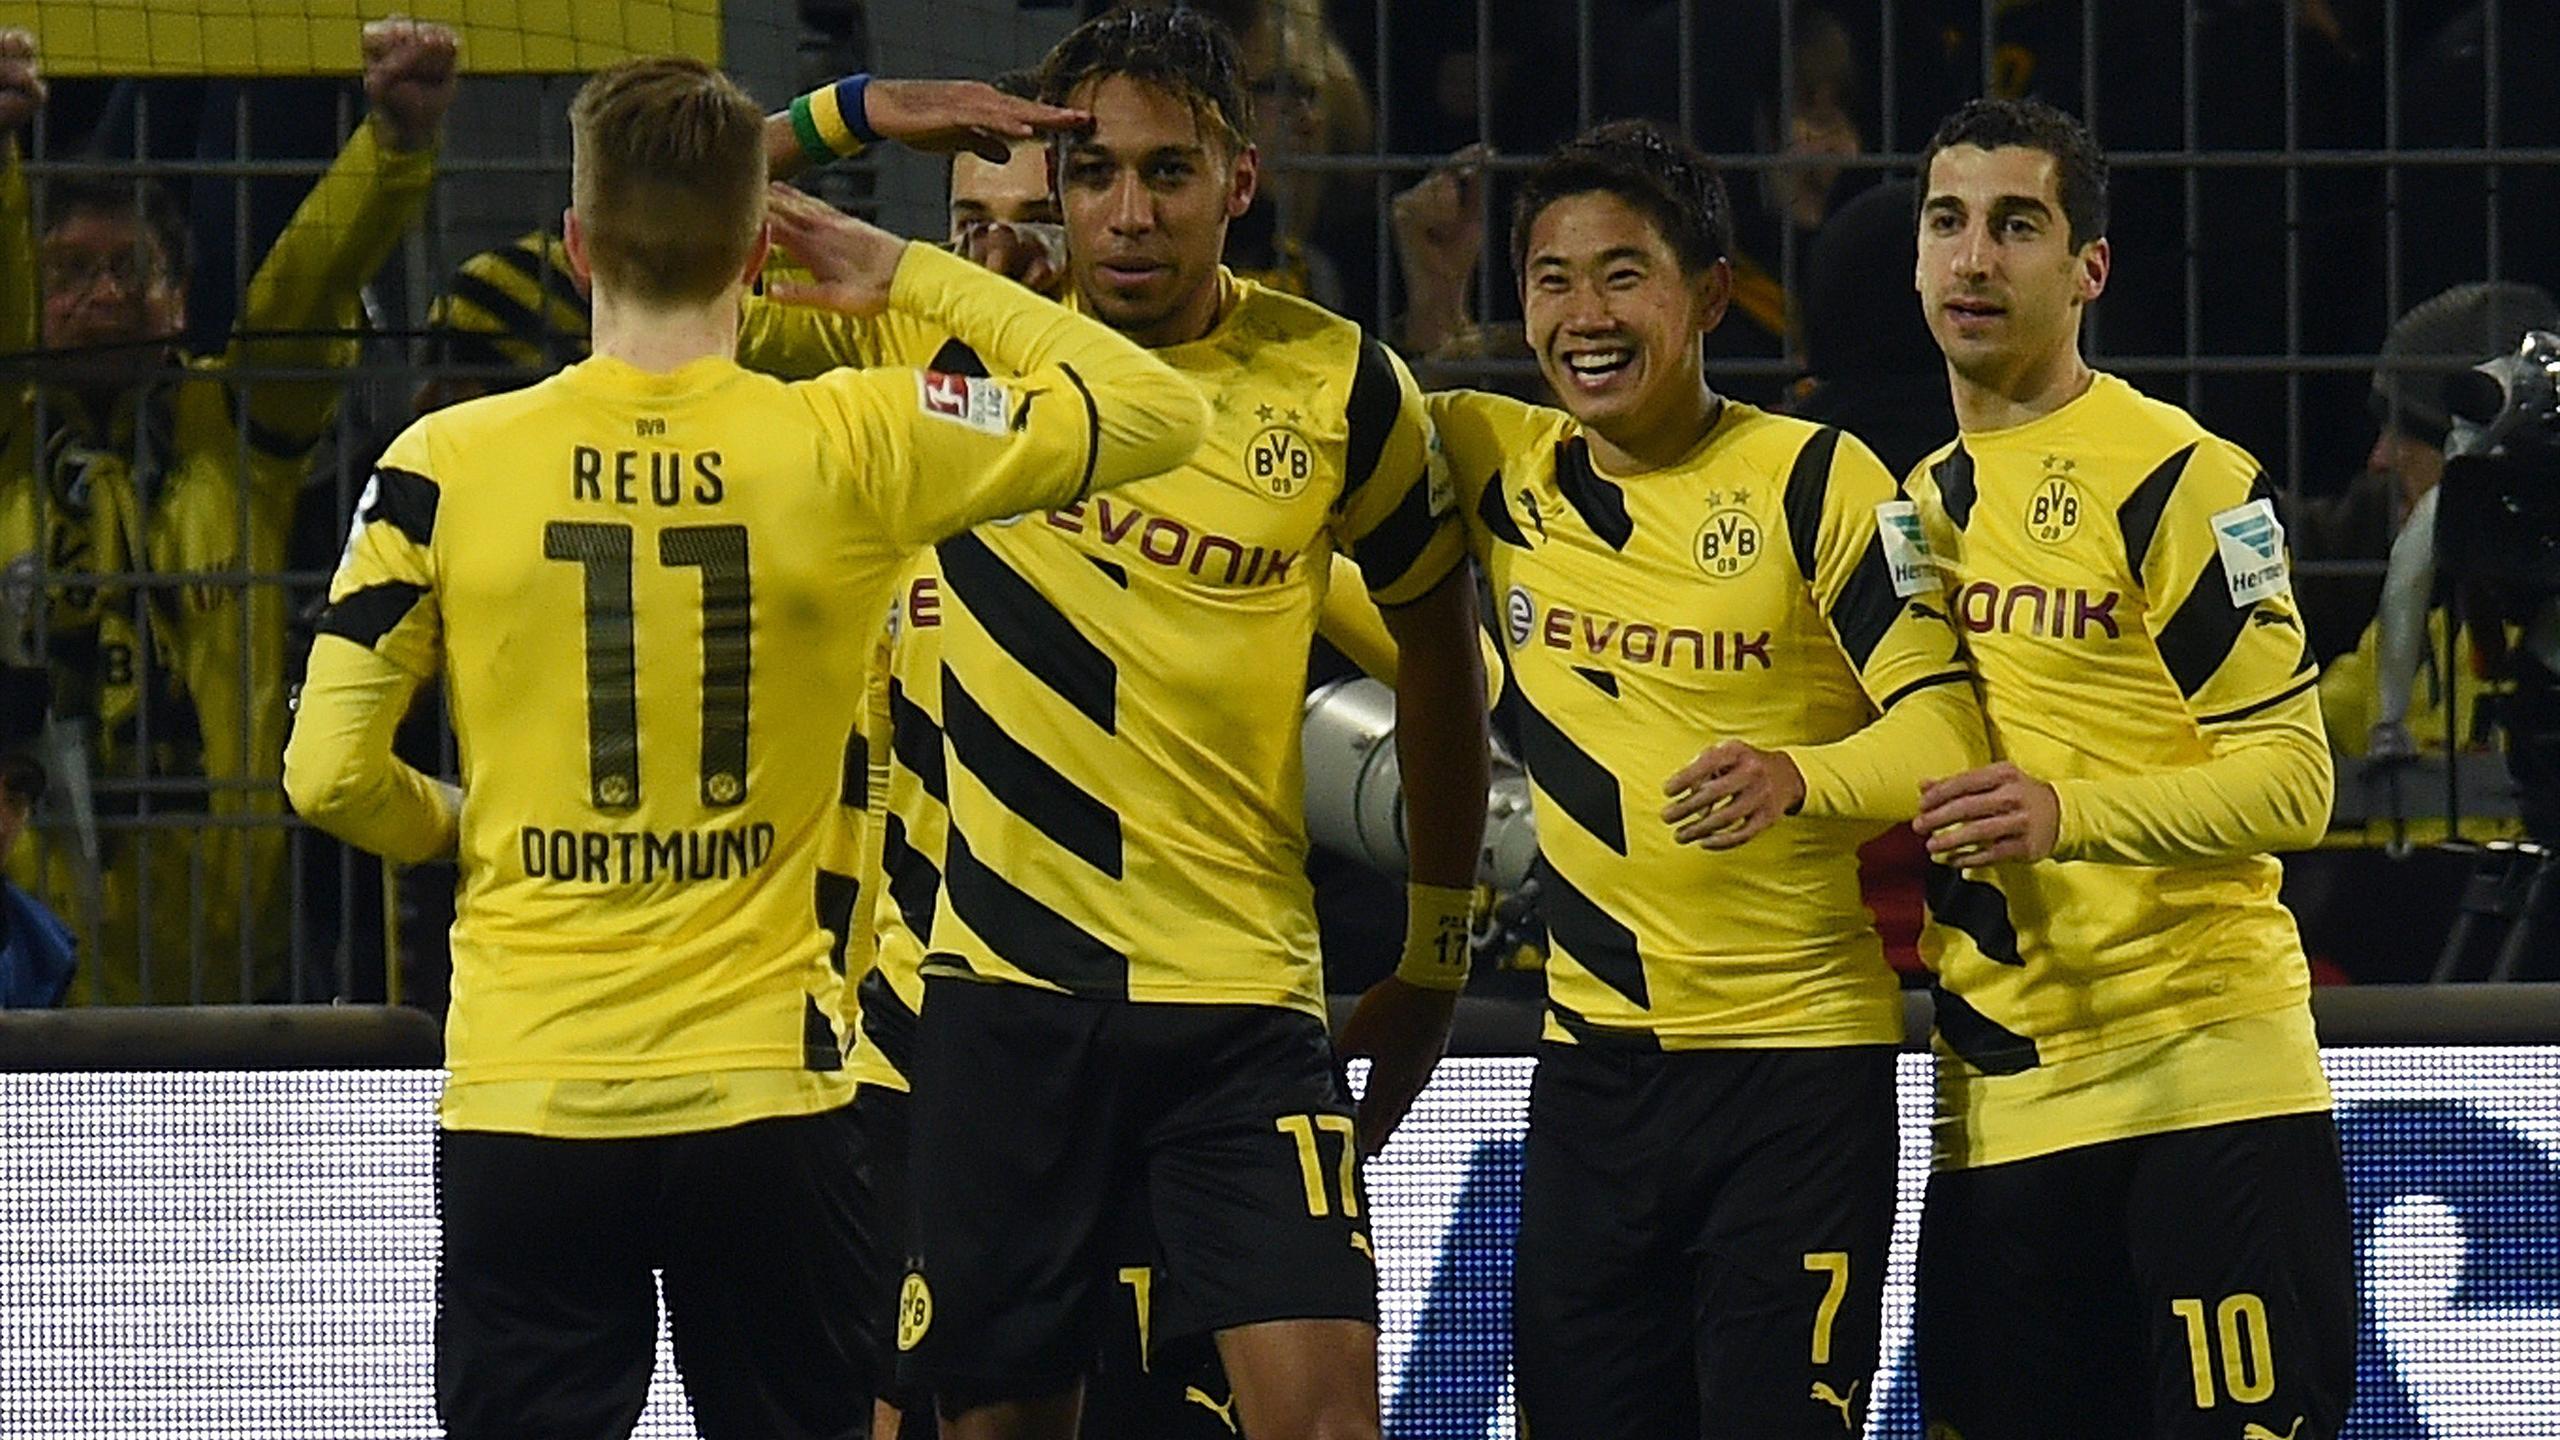 Euroliga Dortmund